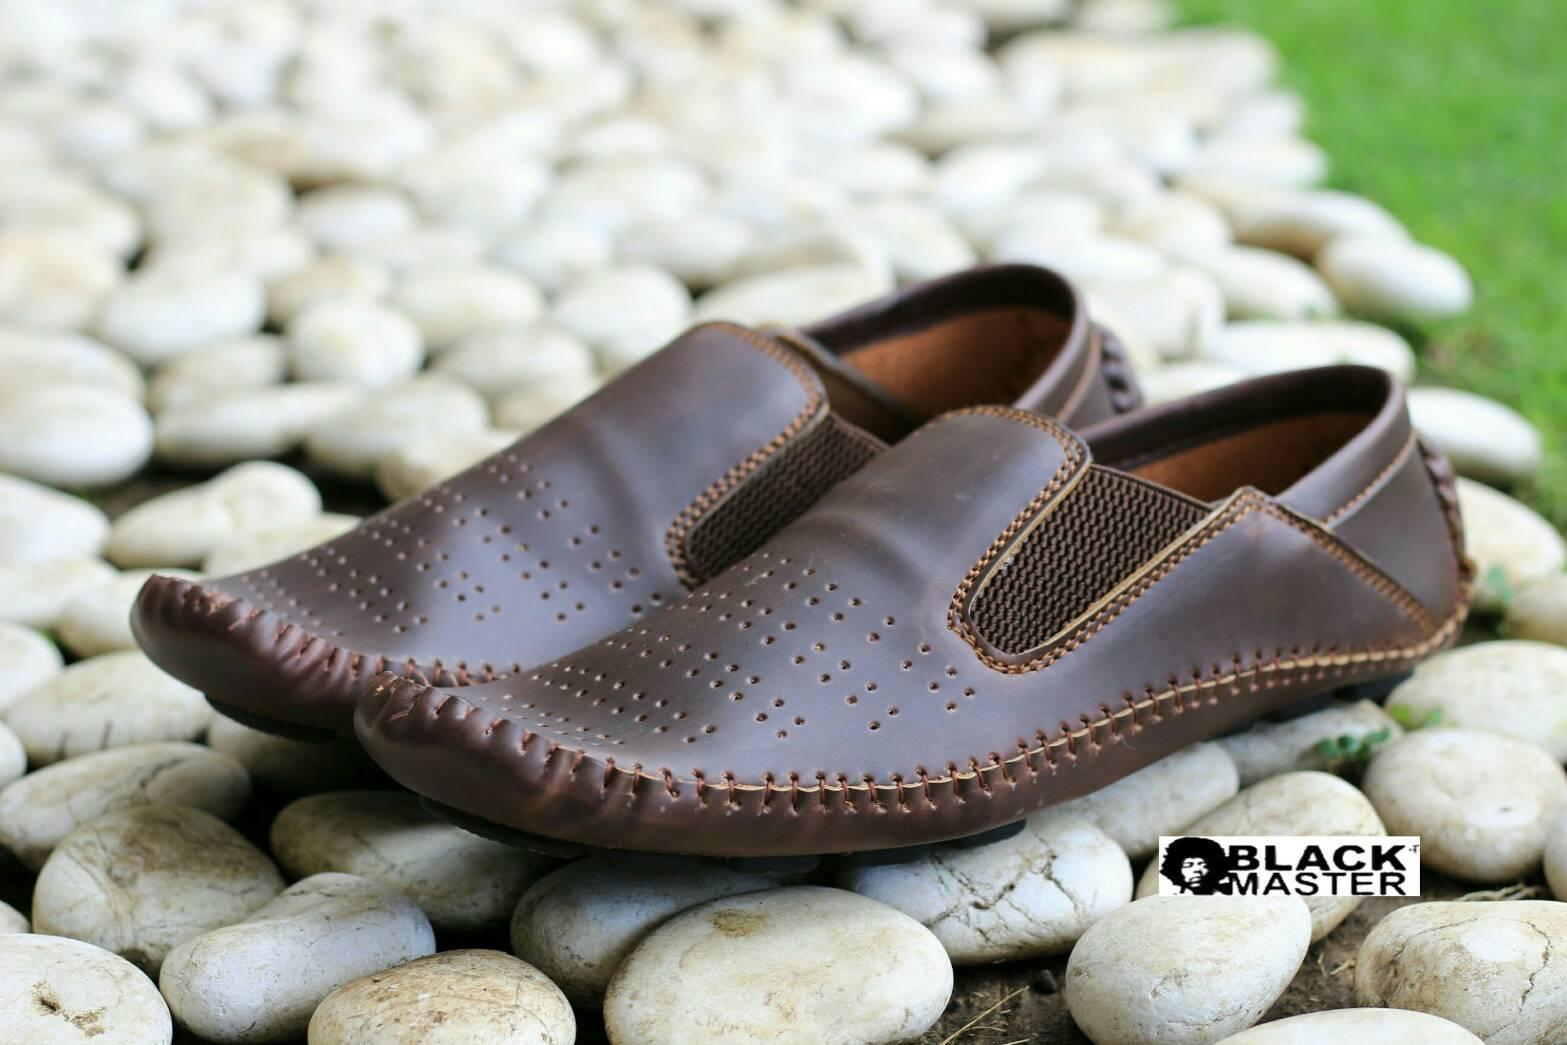 sepatu casual slip on loafer black master original - sepatu mocasin kulit  pria 49c71aa78e